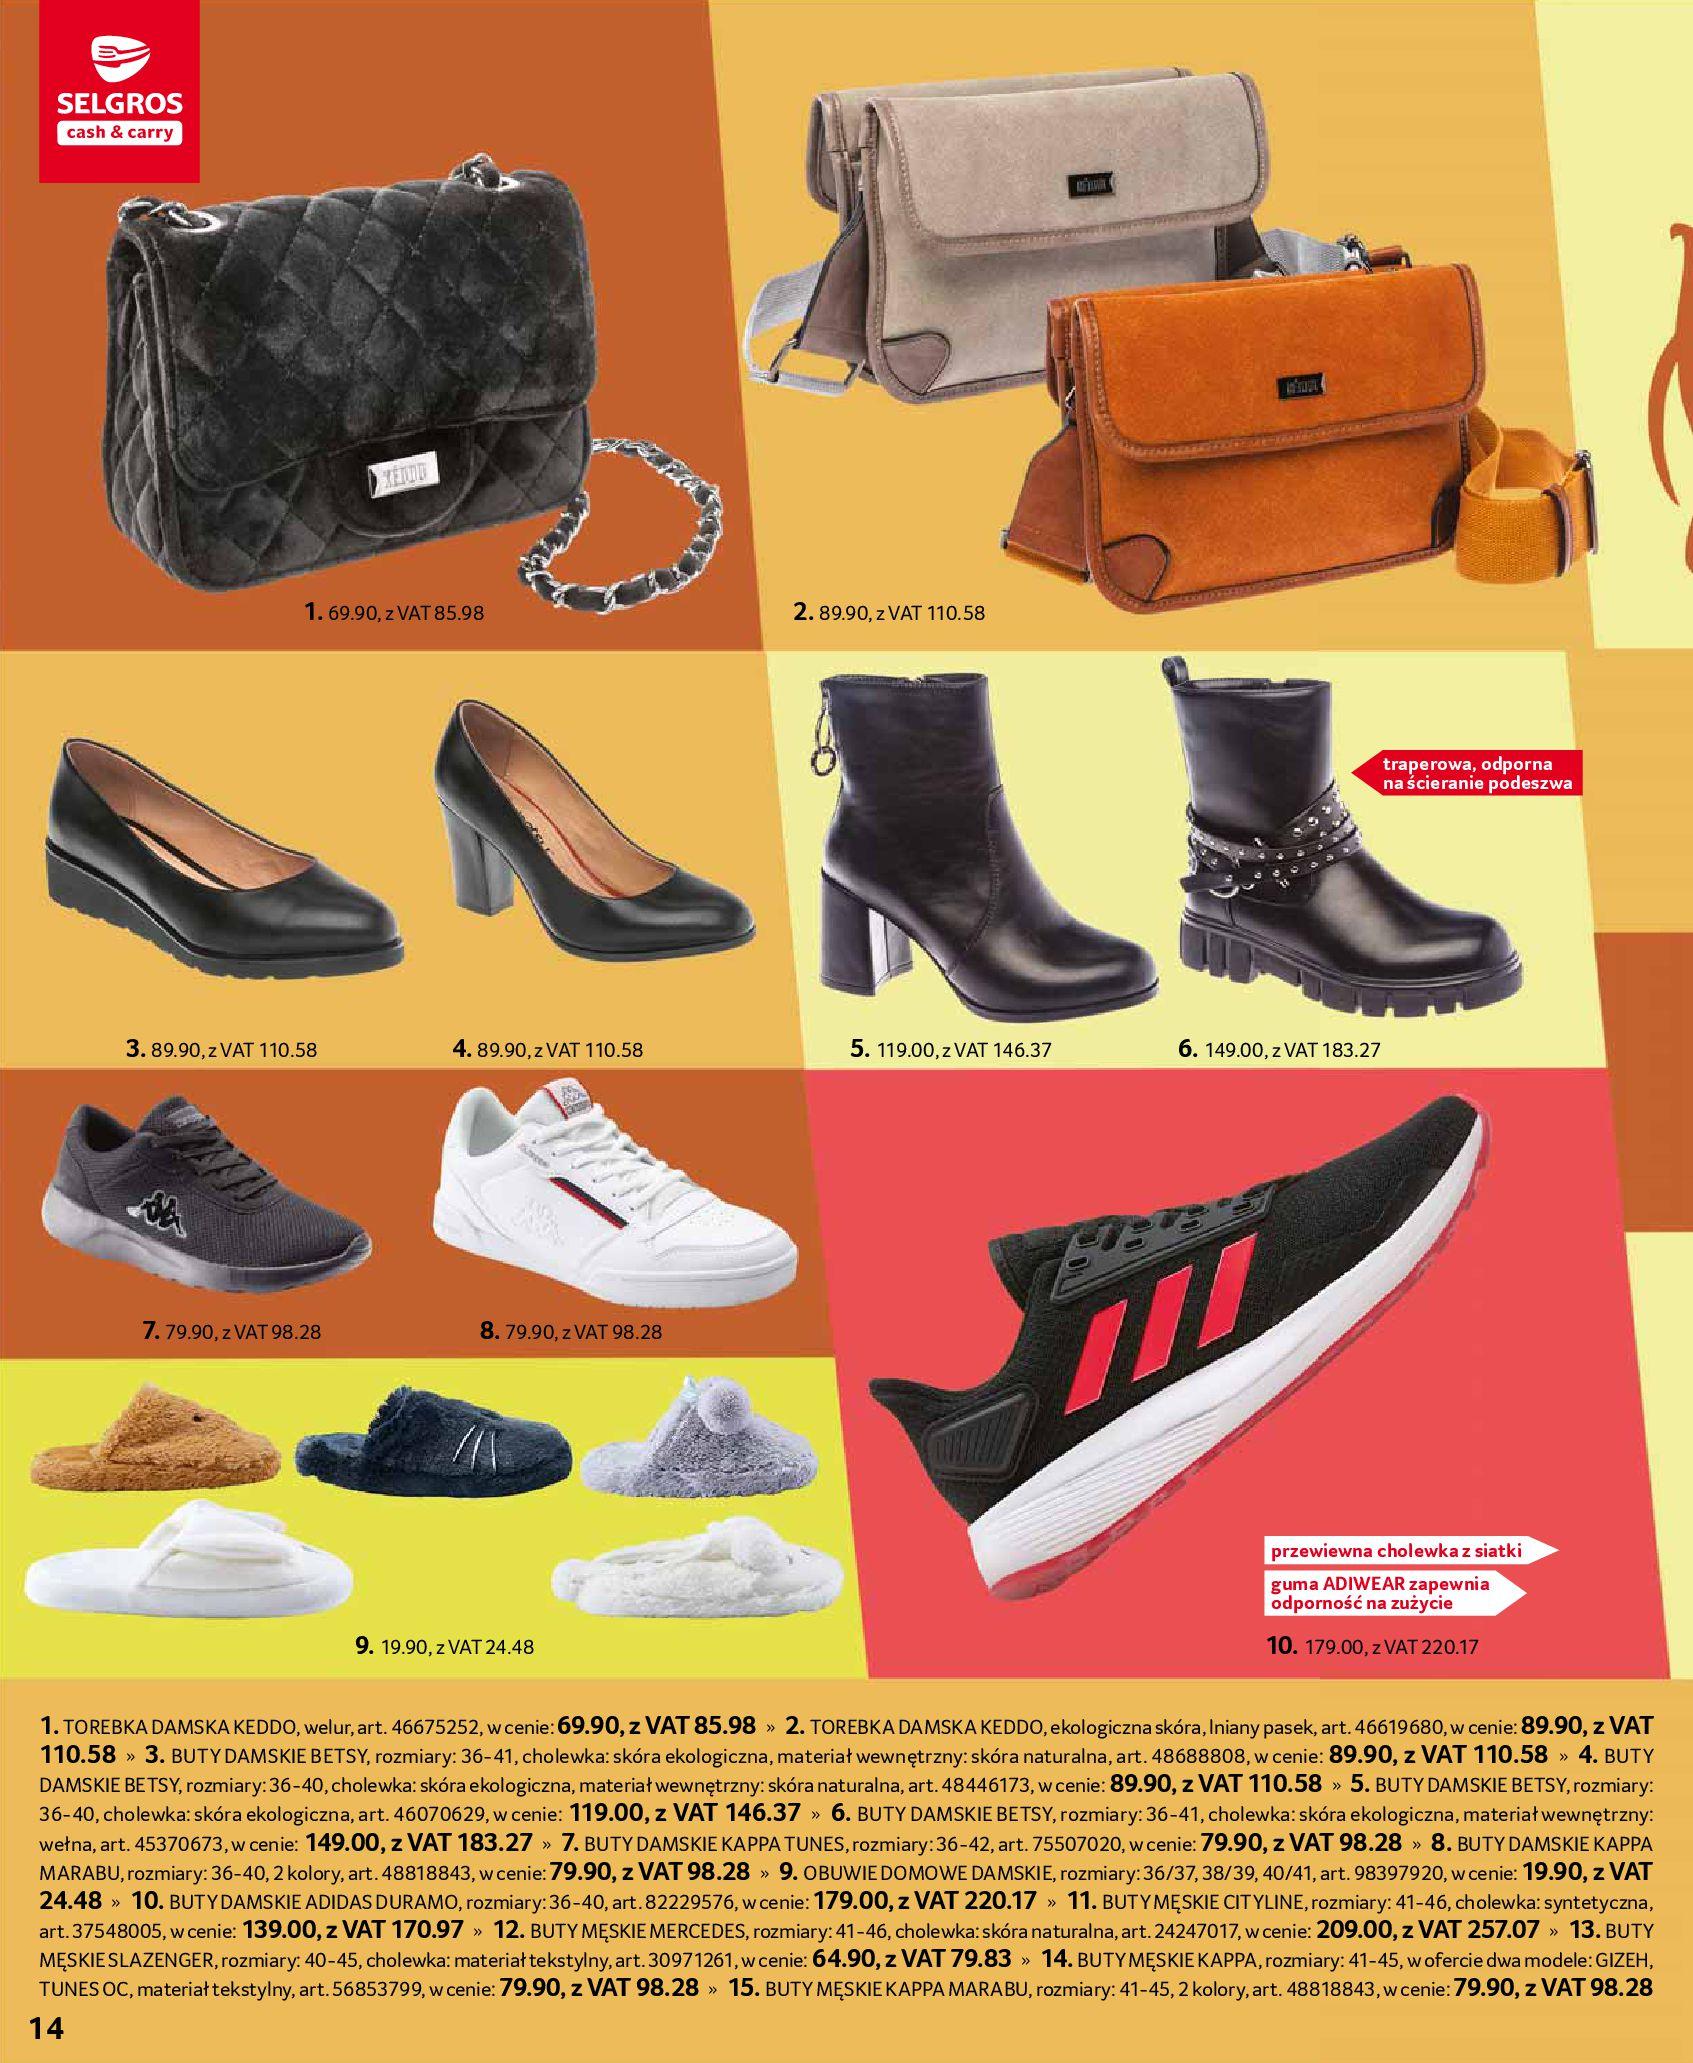 Gazetka Selgros - Katalog tekstylia-11.09.2019-25.09.2019-page-